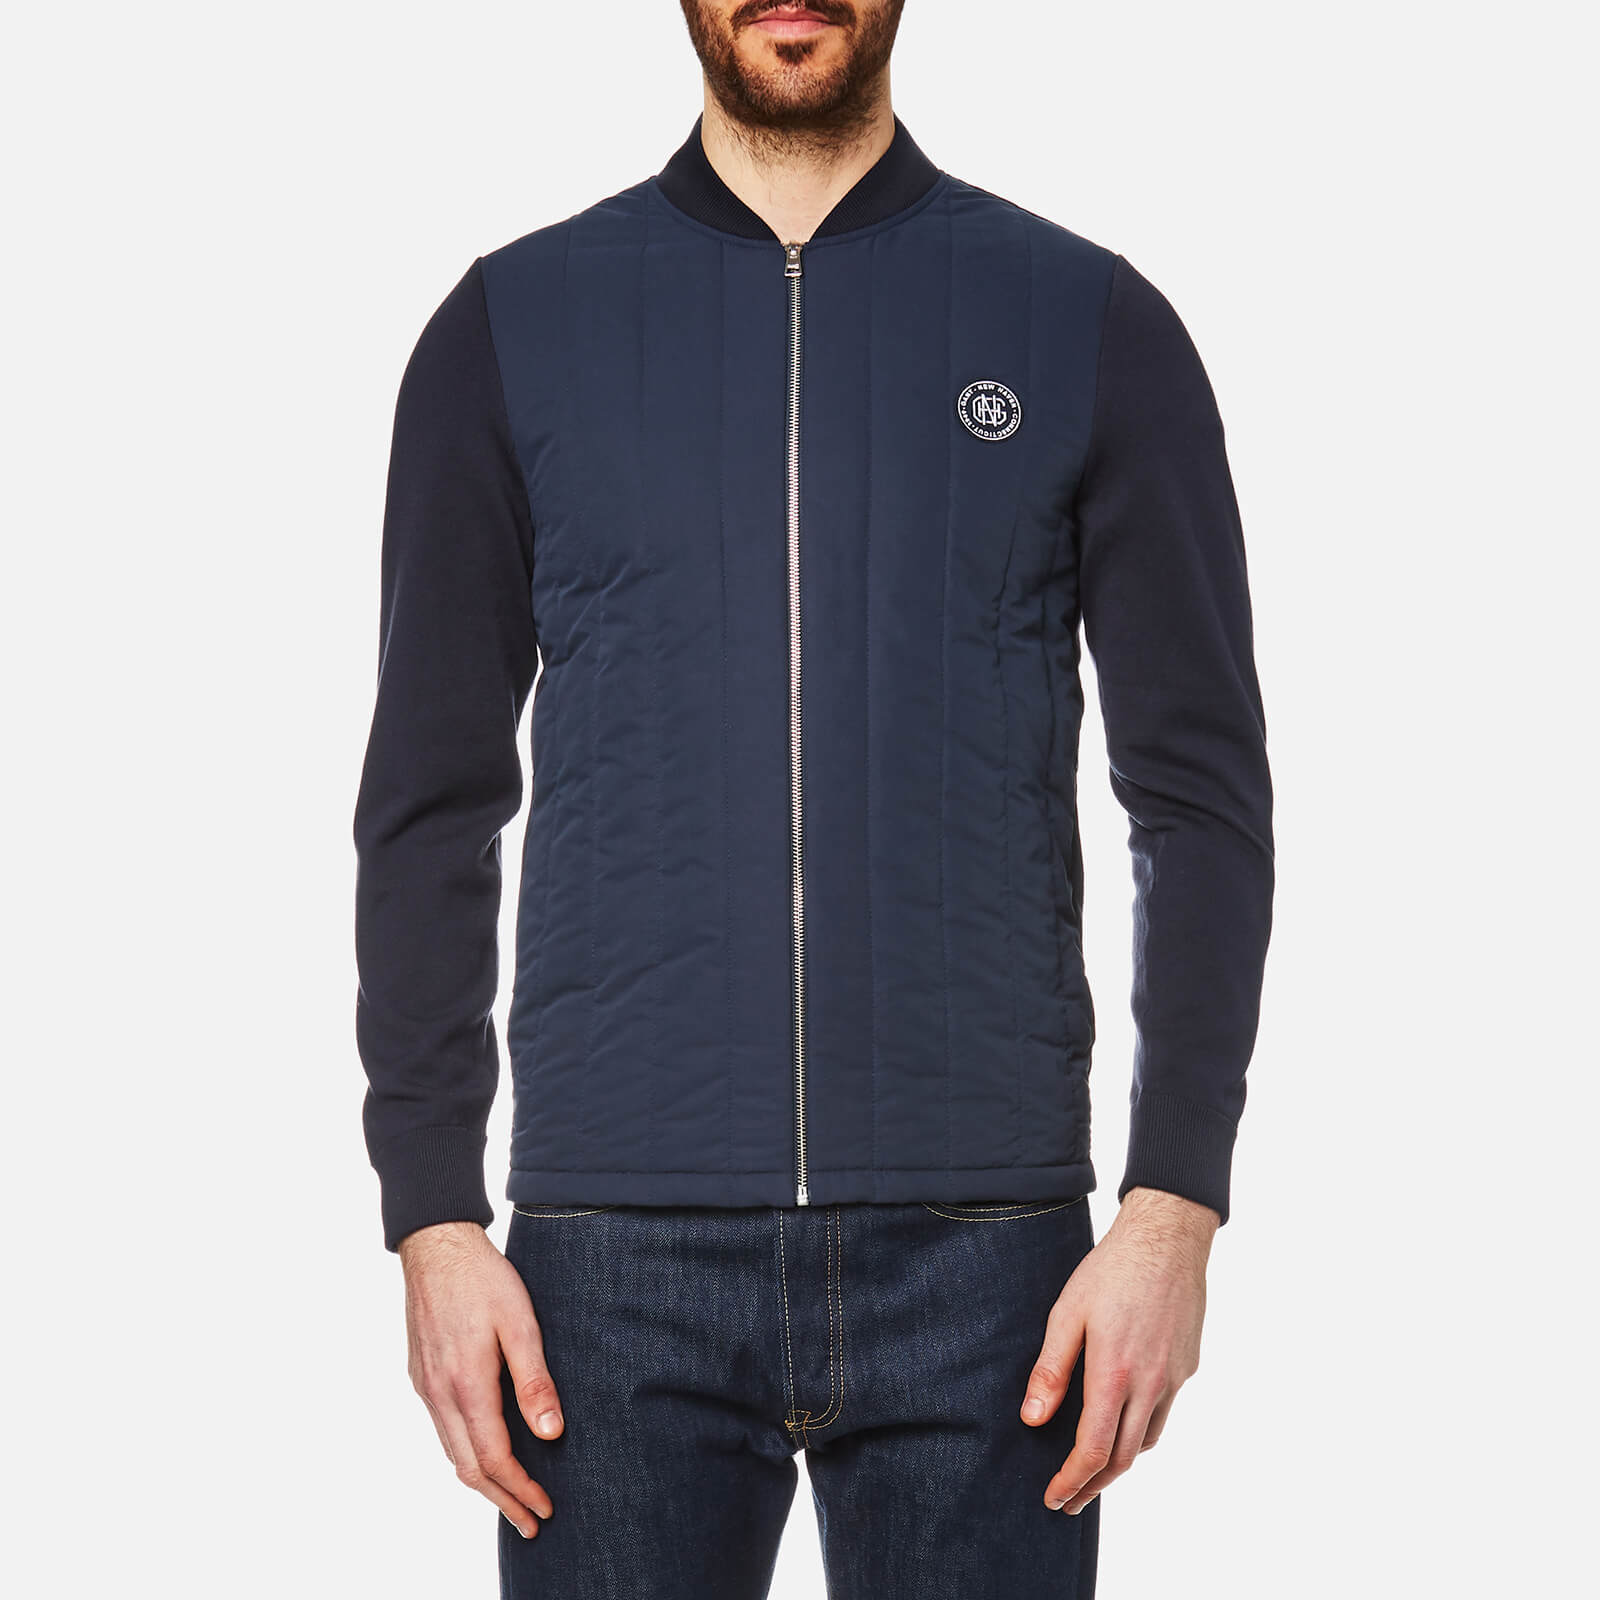 dcaefb91ebc GANT Men's Cotton Knit Jacket - Evening Blue Clothing   TheHut.com